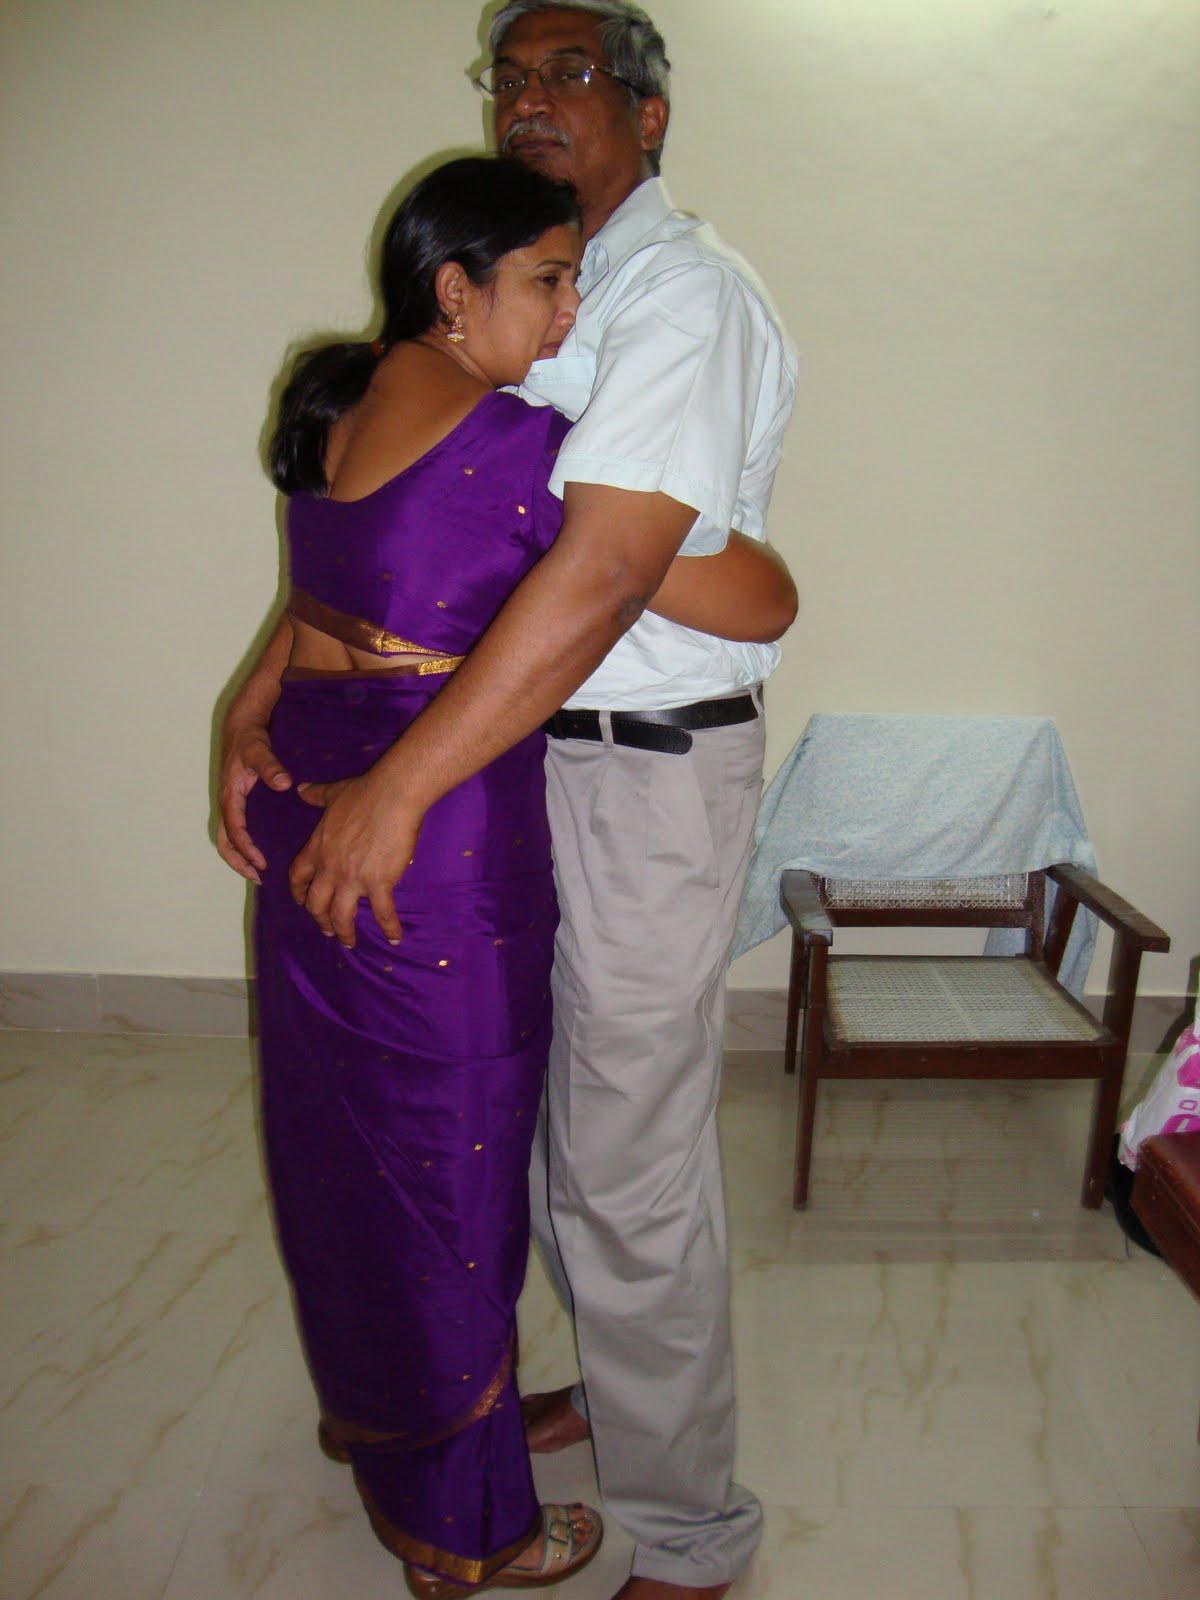 Escort services in bangalore 09663589282 - 3 part 6